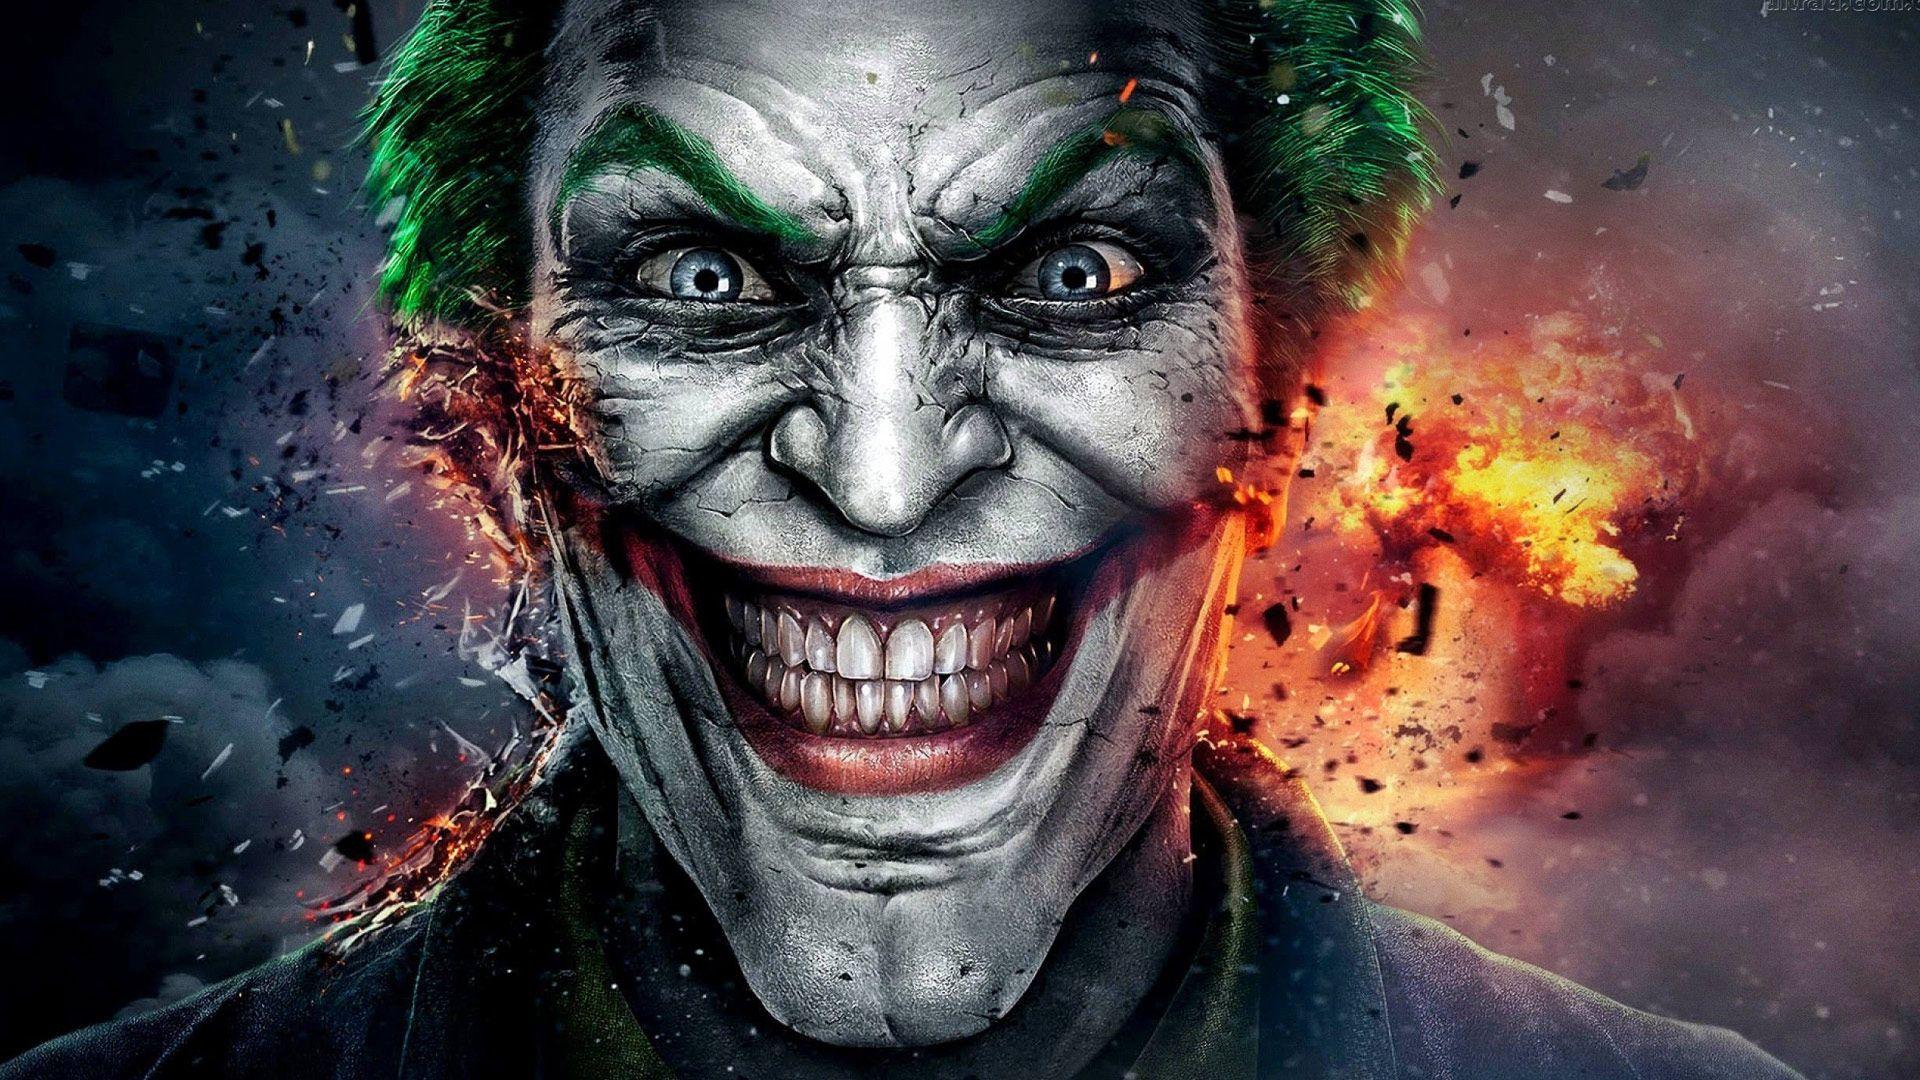 Wallpaper Hd 1080p Find Best Latest Wallpaper Hd 1080p In Hd For Your Pc Desktop Background Amp Mobile Phones Joker Wallpapers Batman Joker Joker Face